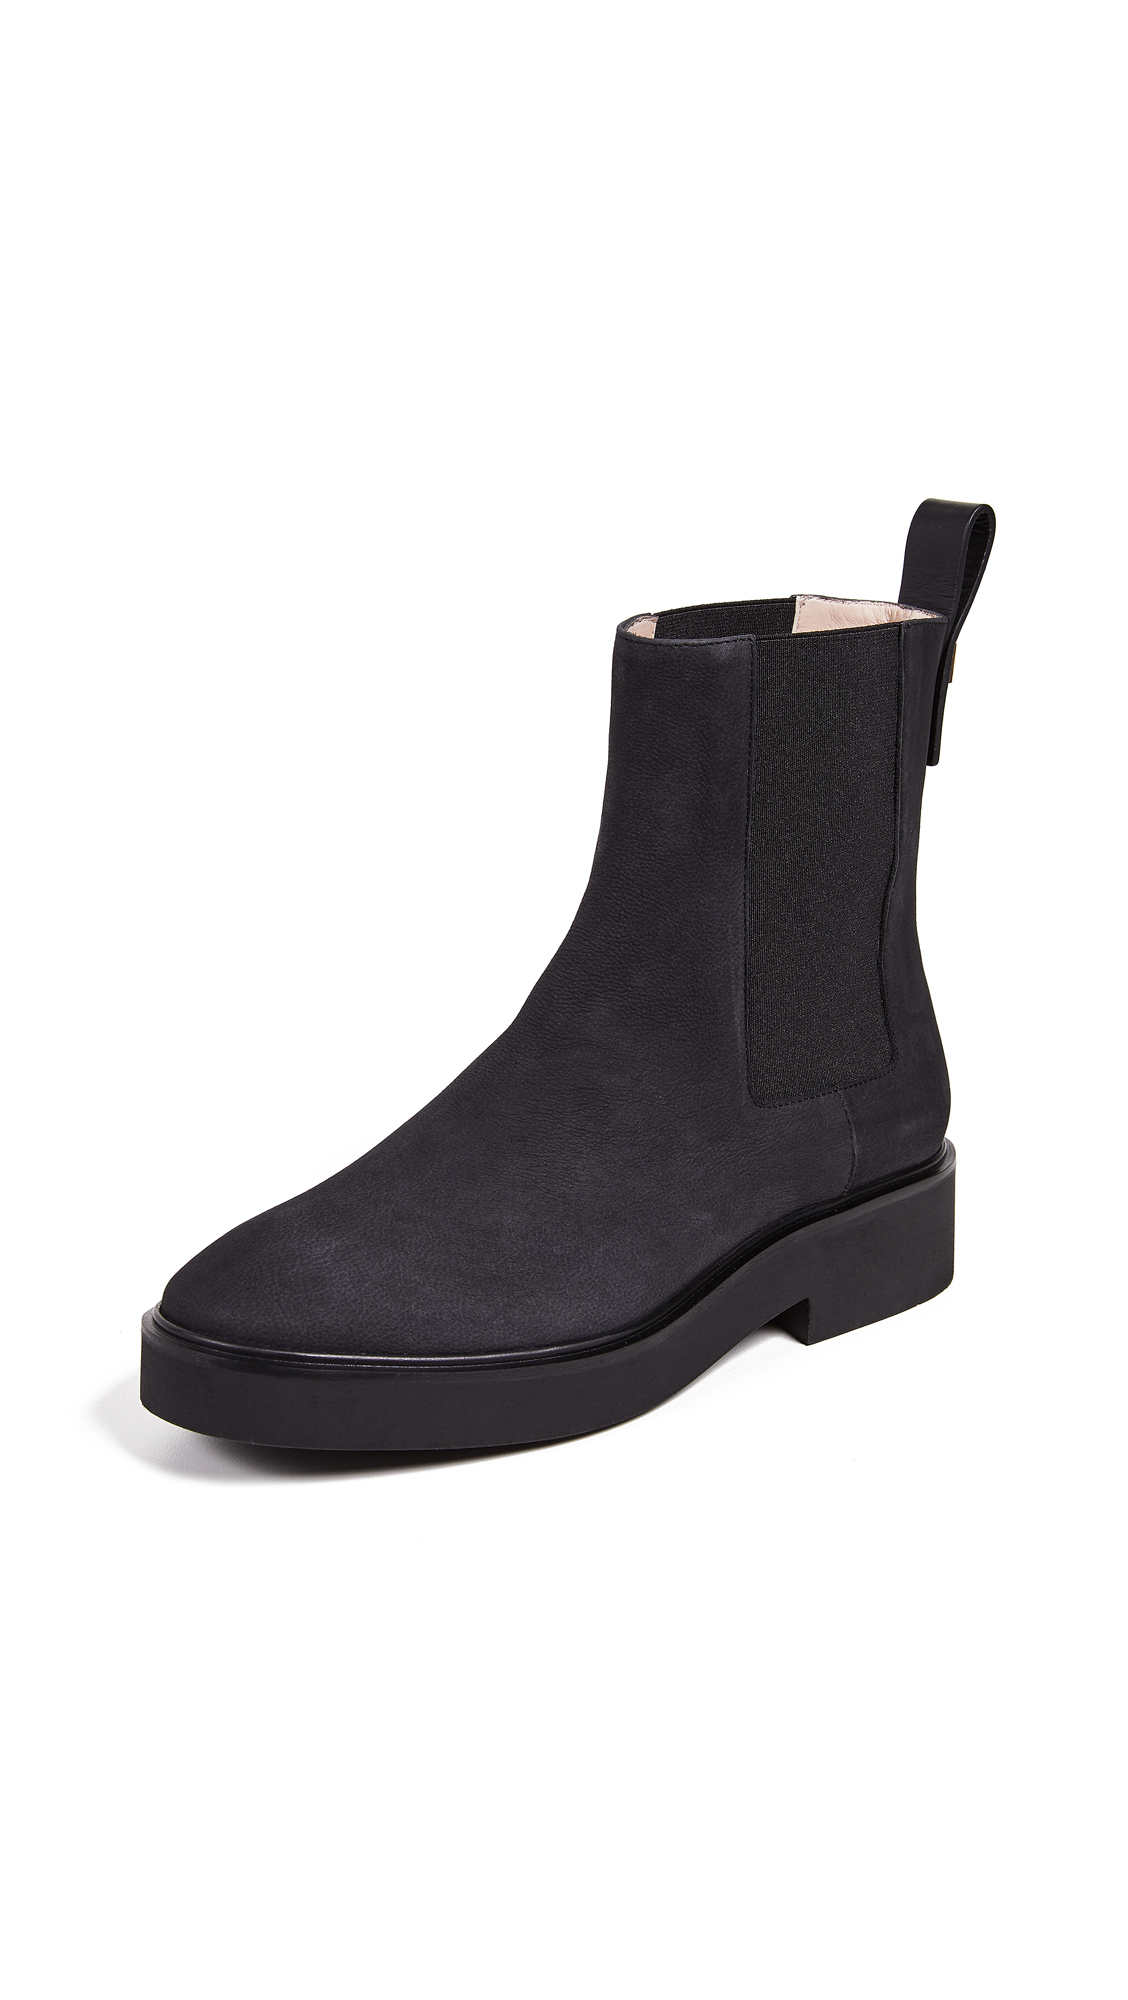 Stuart Weitzman Meriwa Boots - Pitch Black